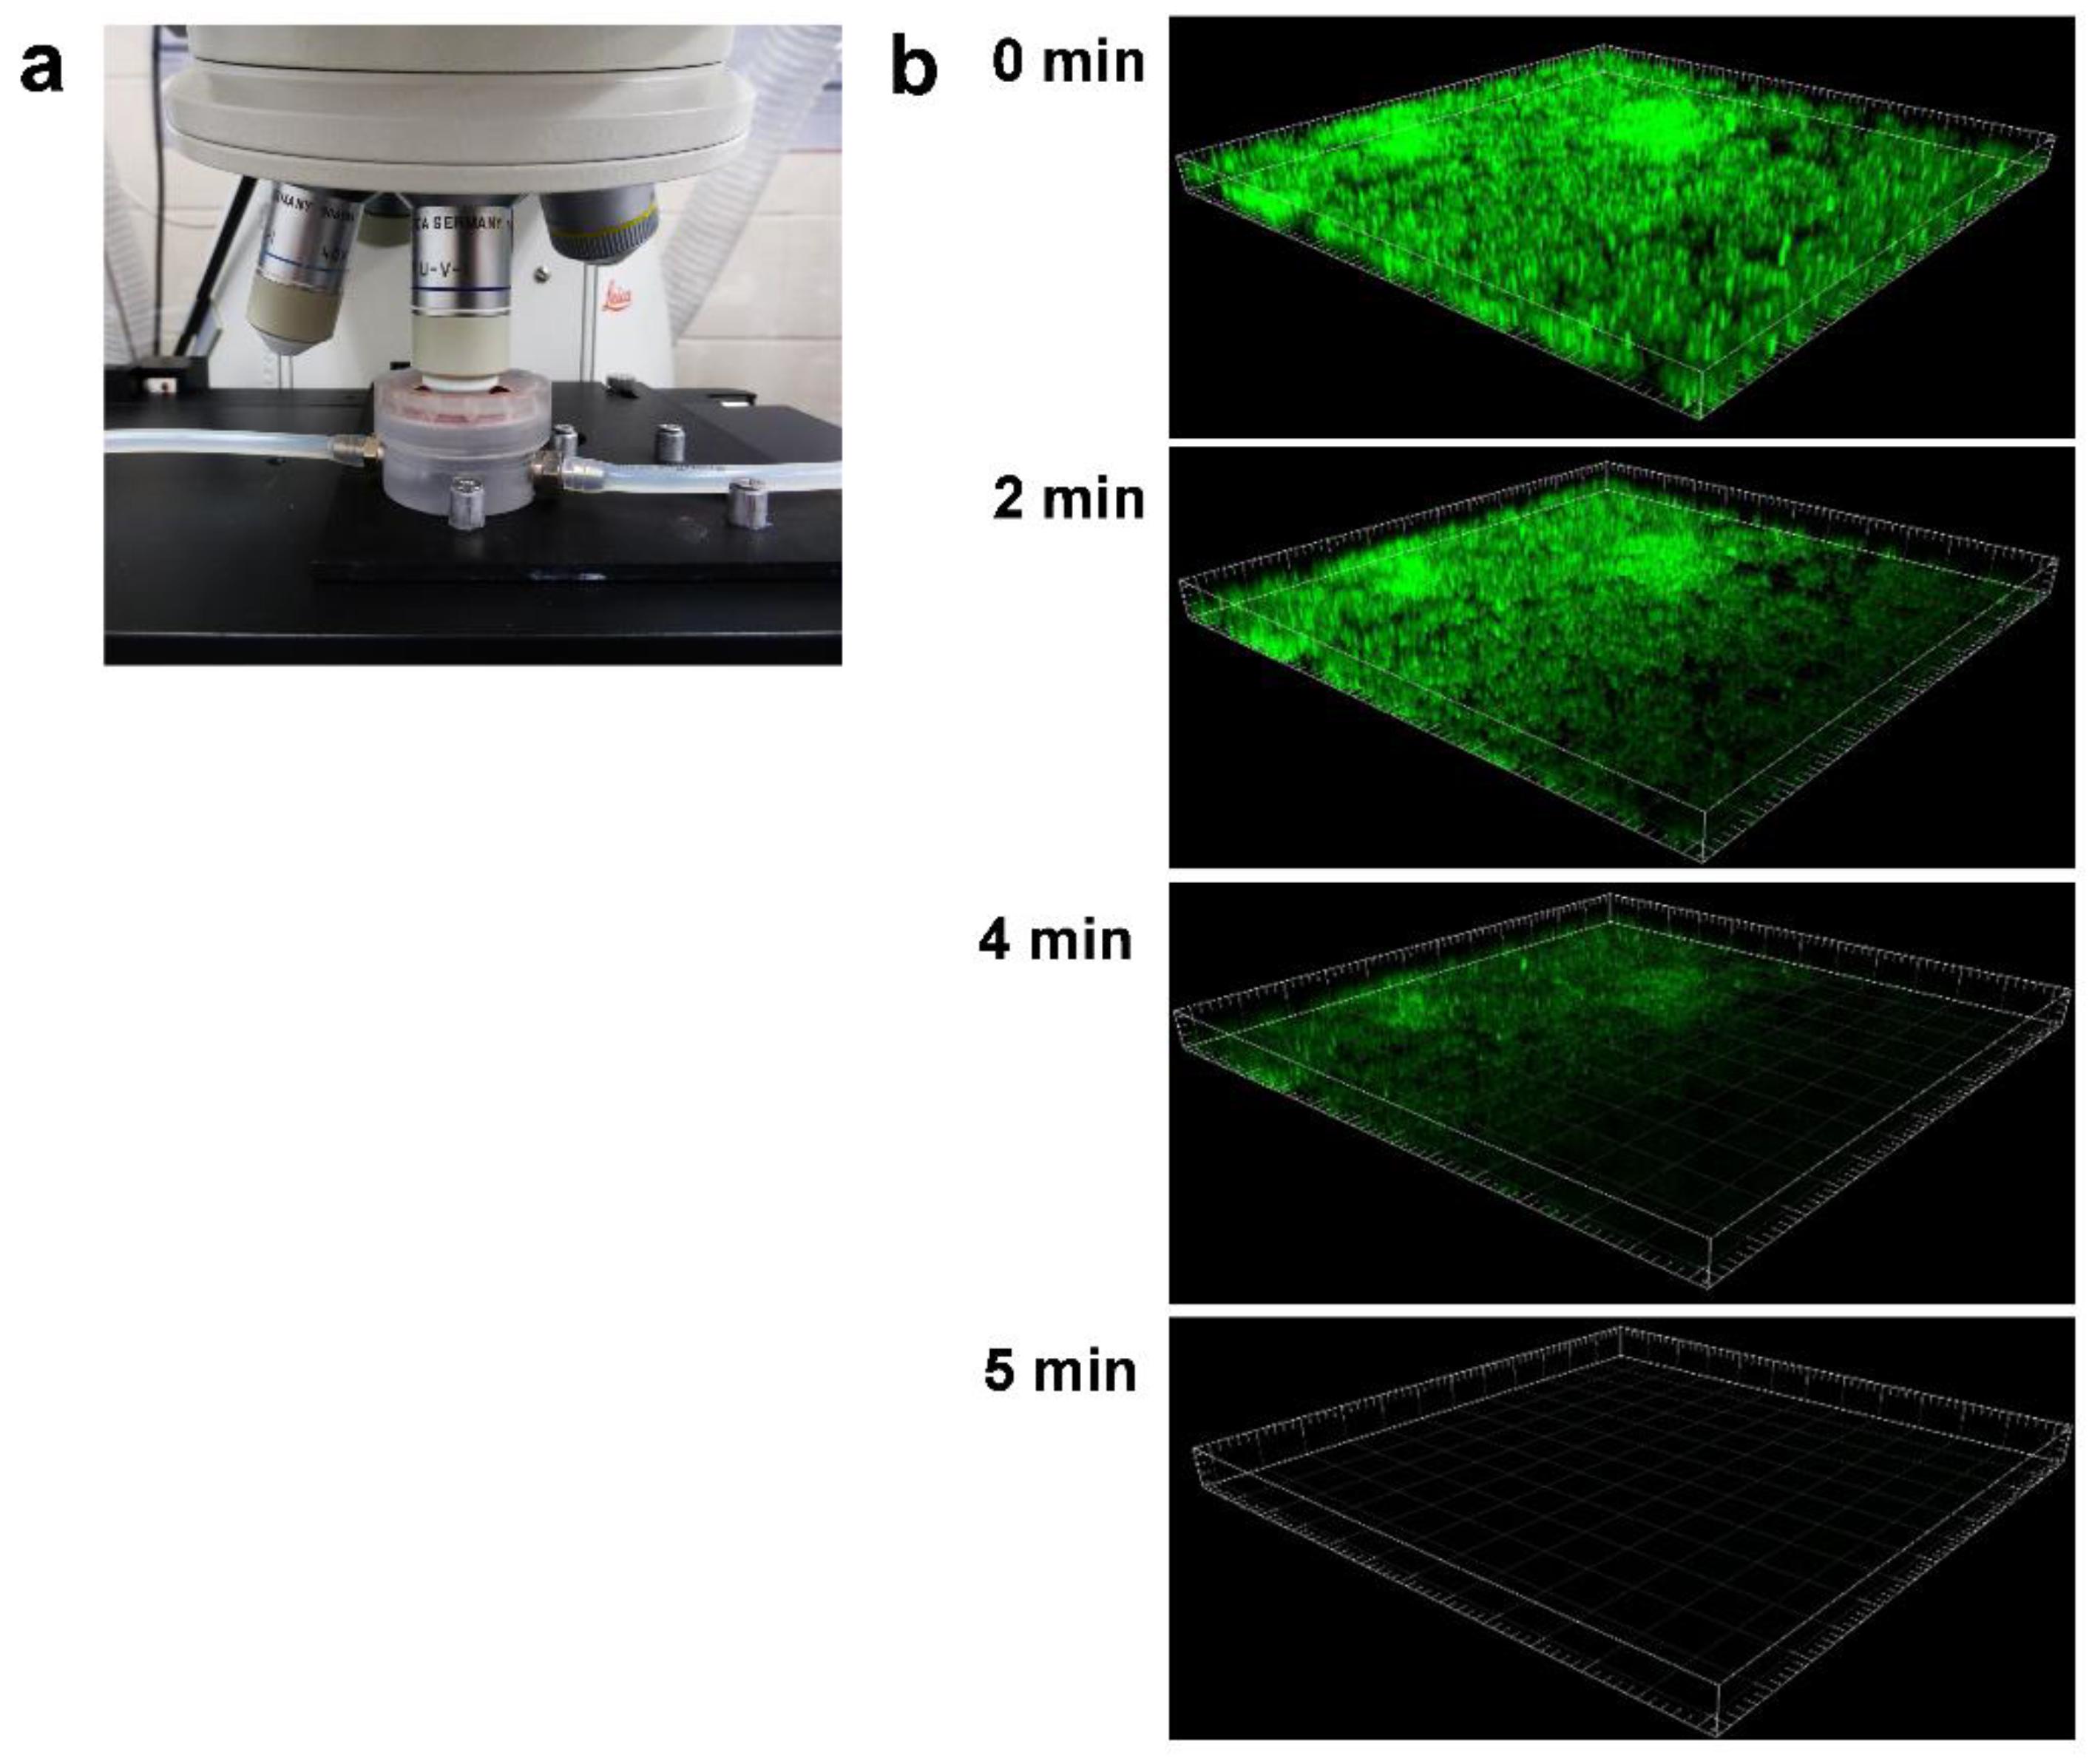 IJMS   Free Full-Text   Testing Anti-Biofilm Polymeric